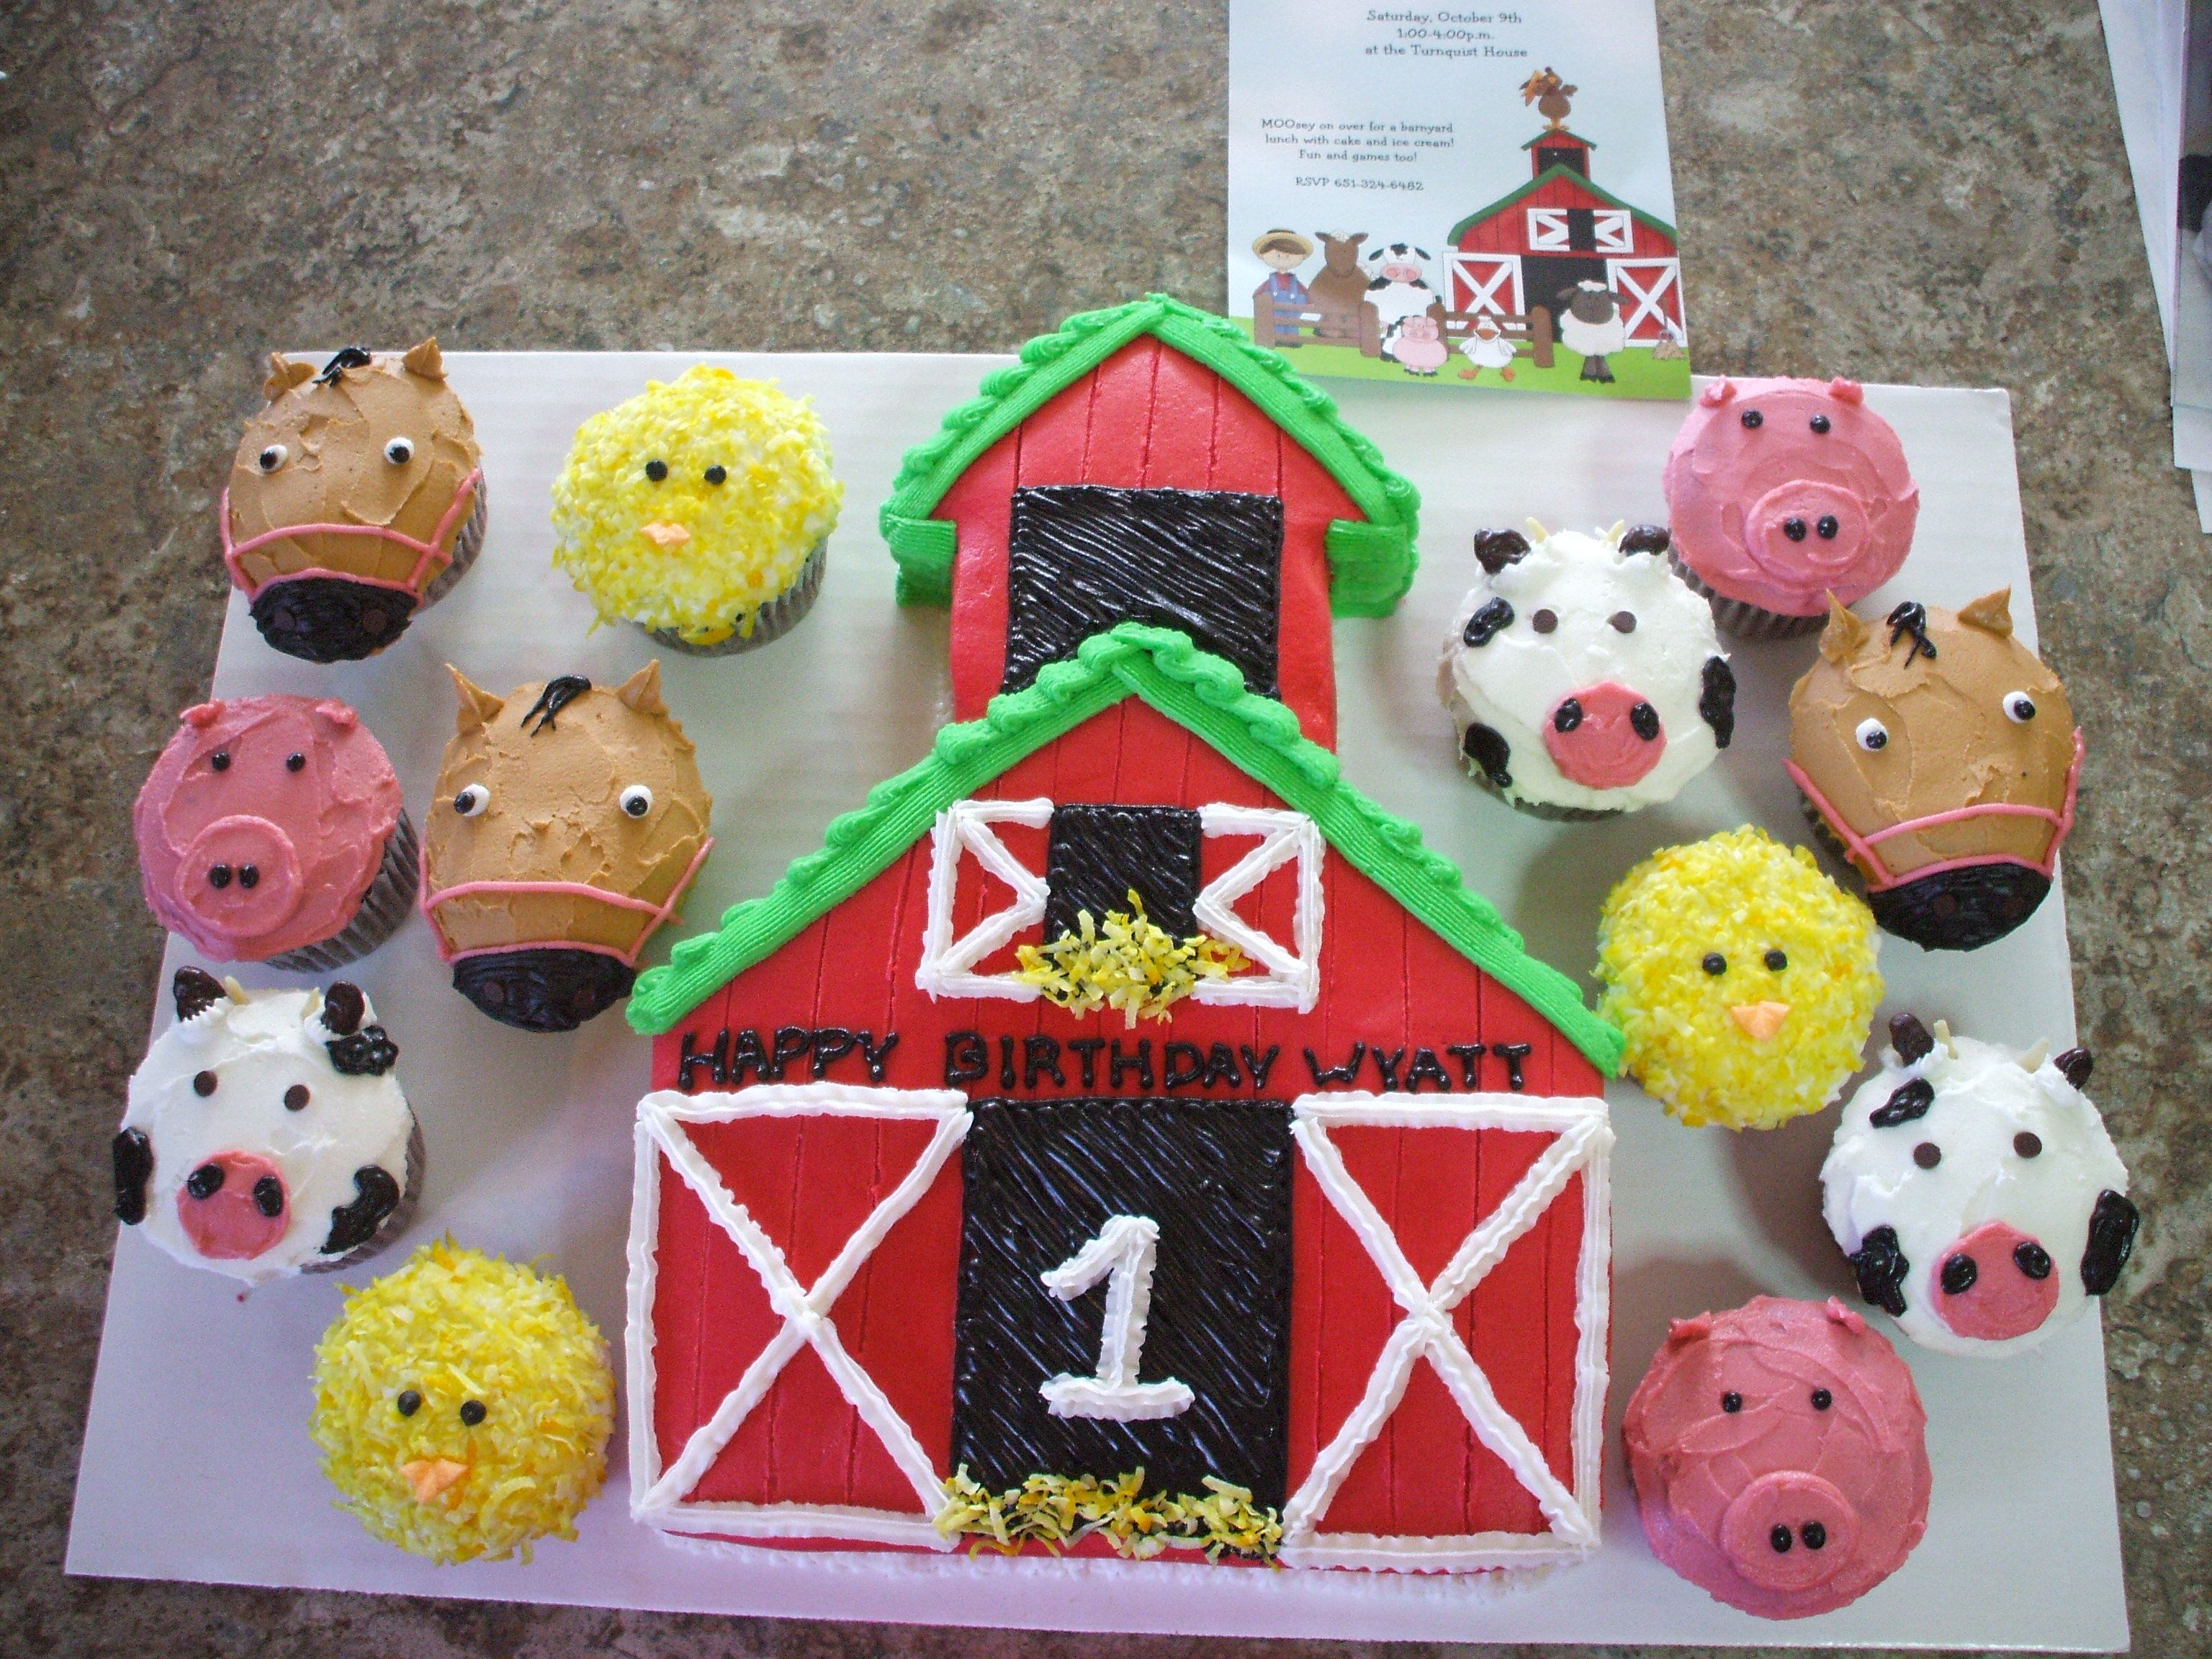 Cute Farm Cake I Made With Animal Cupcakes